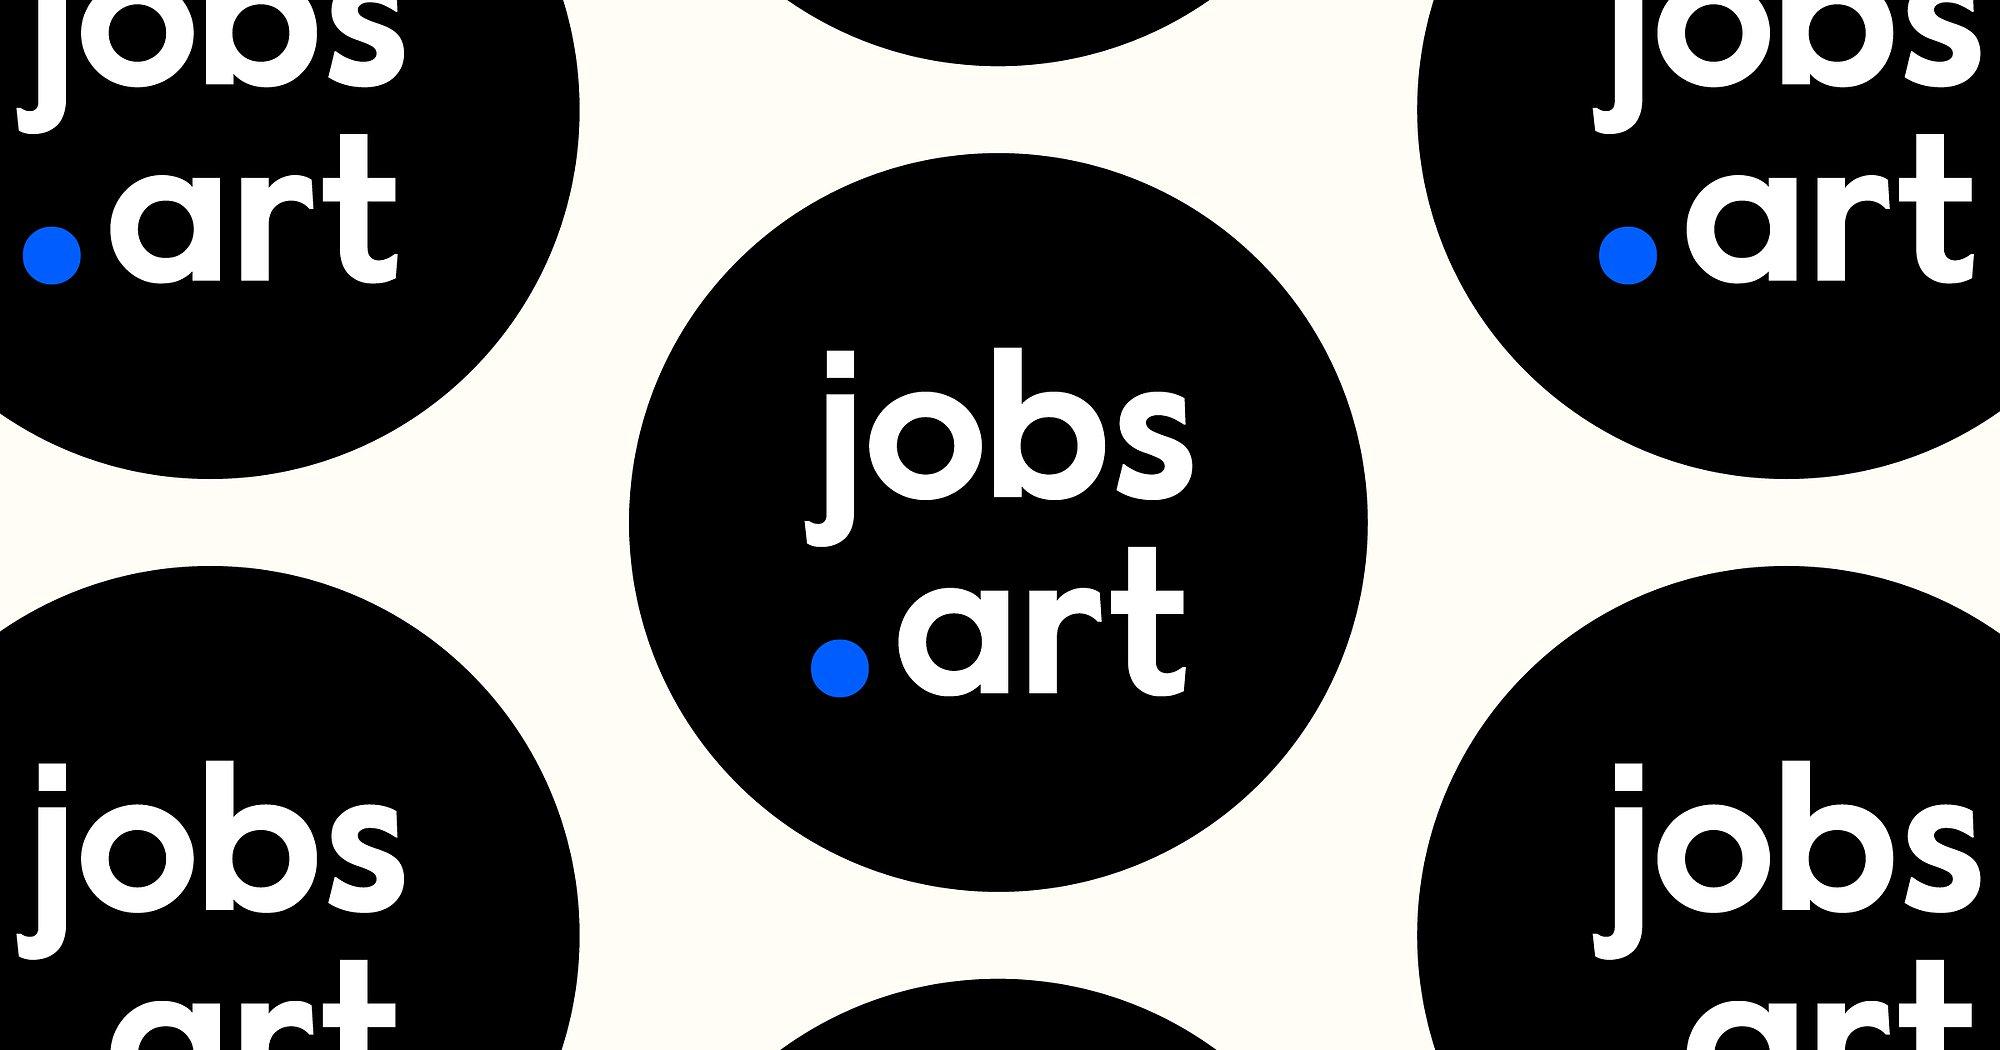 Jobs art